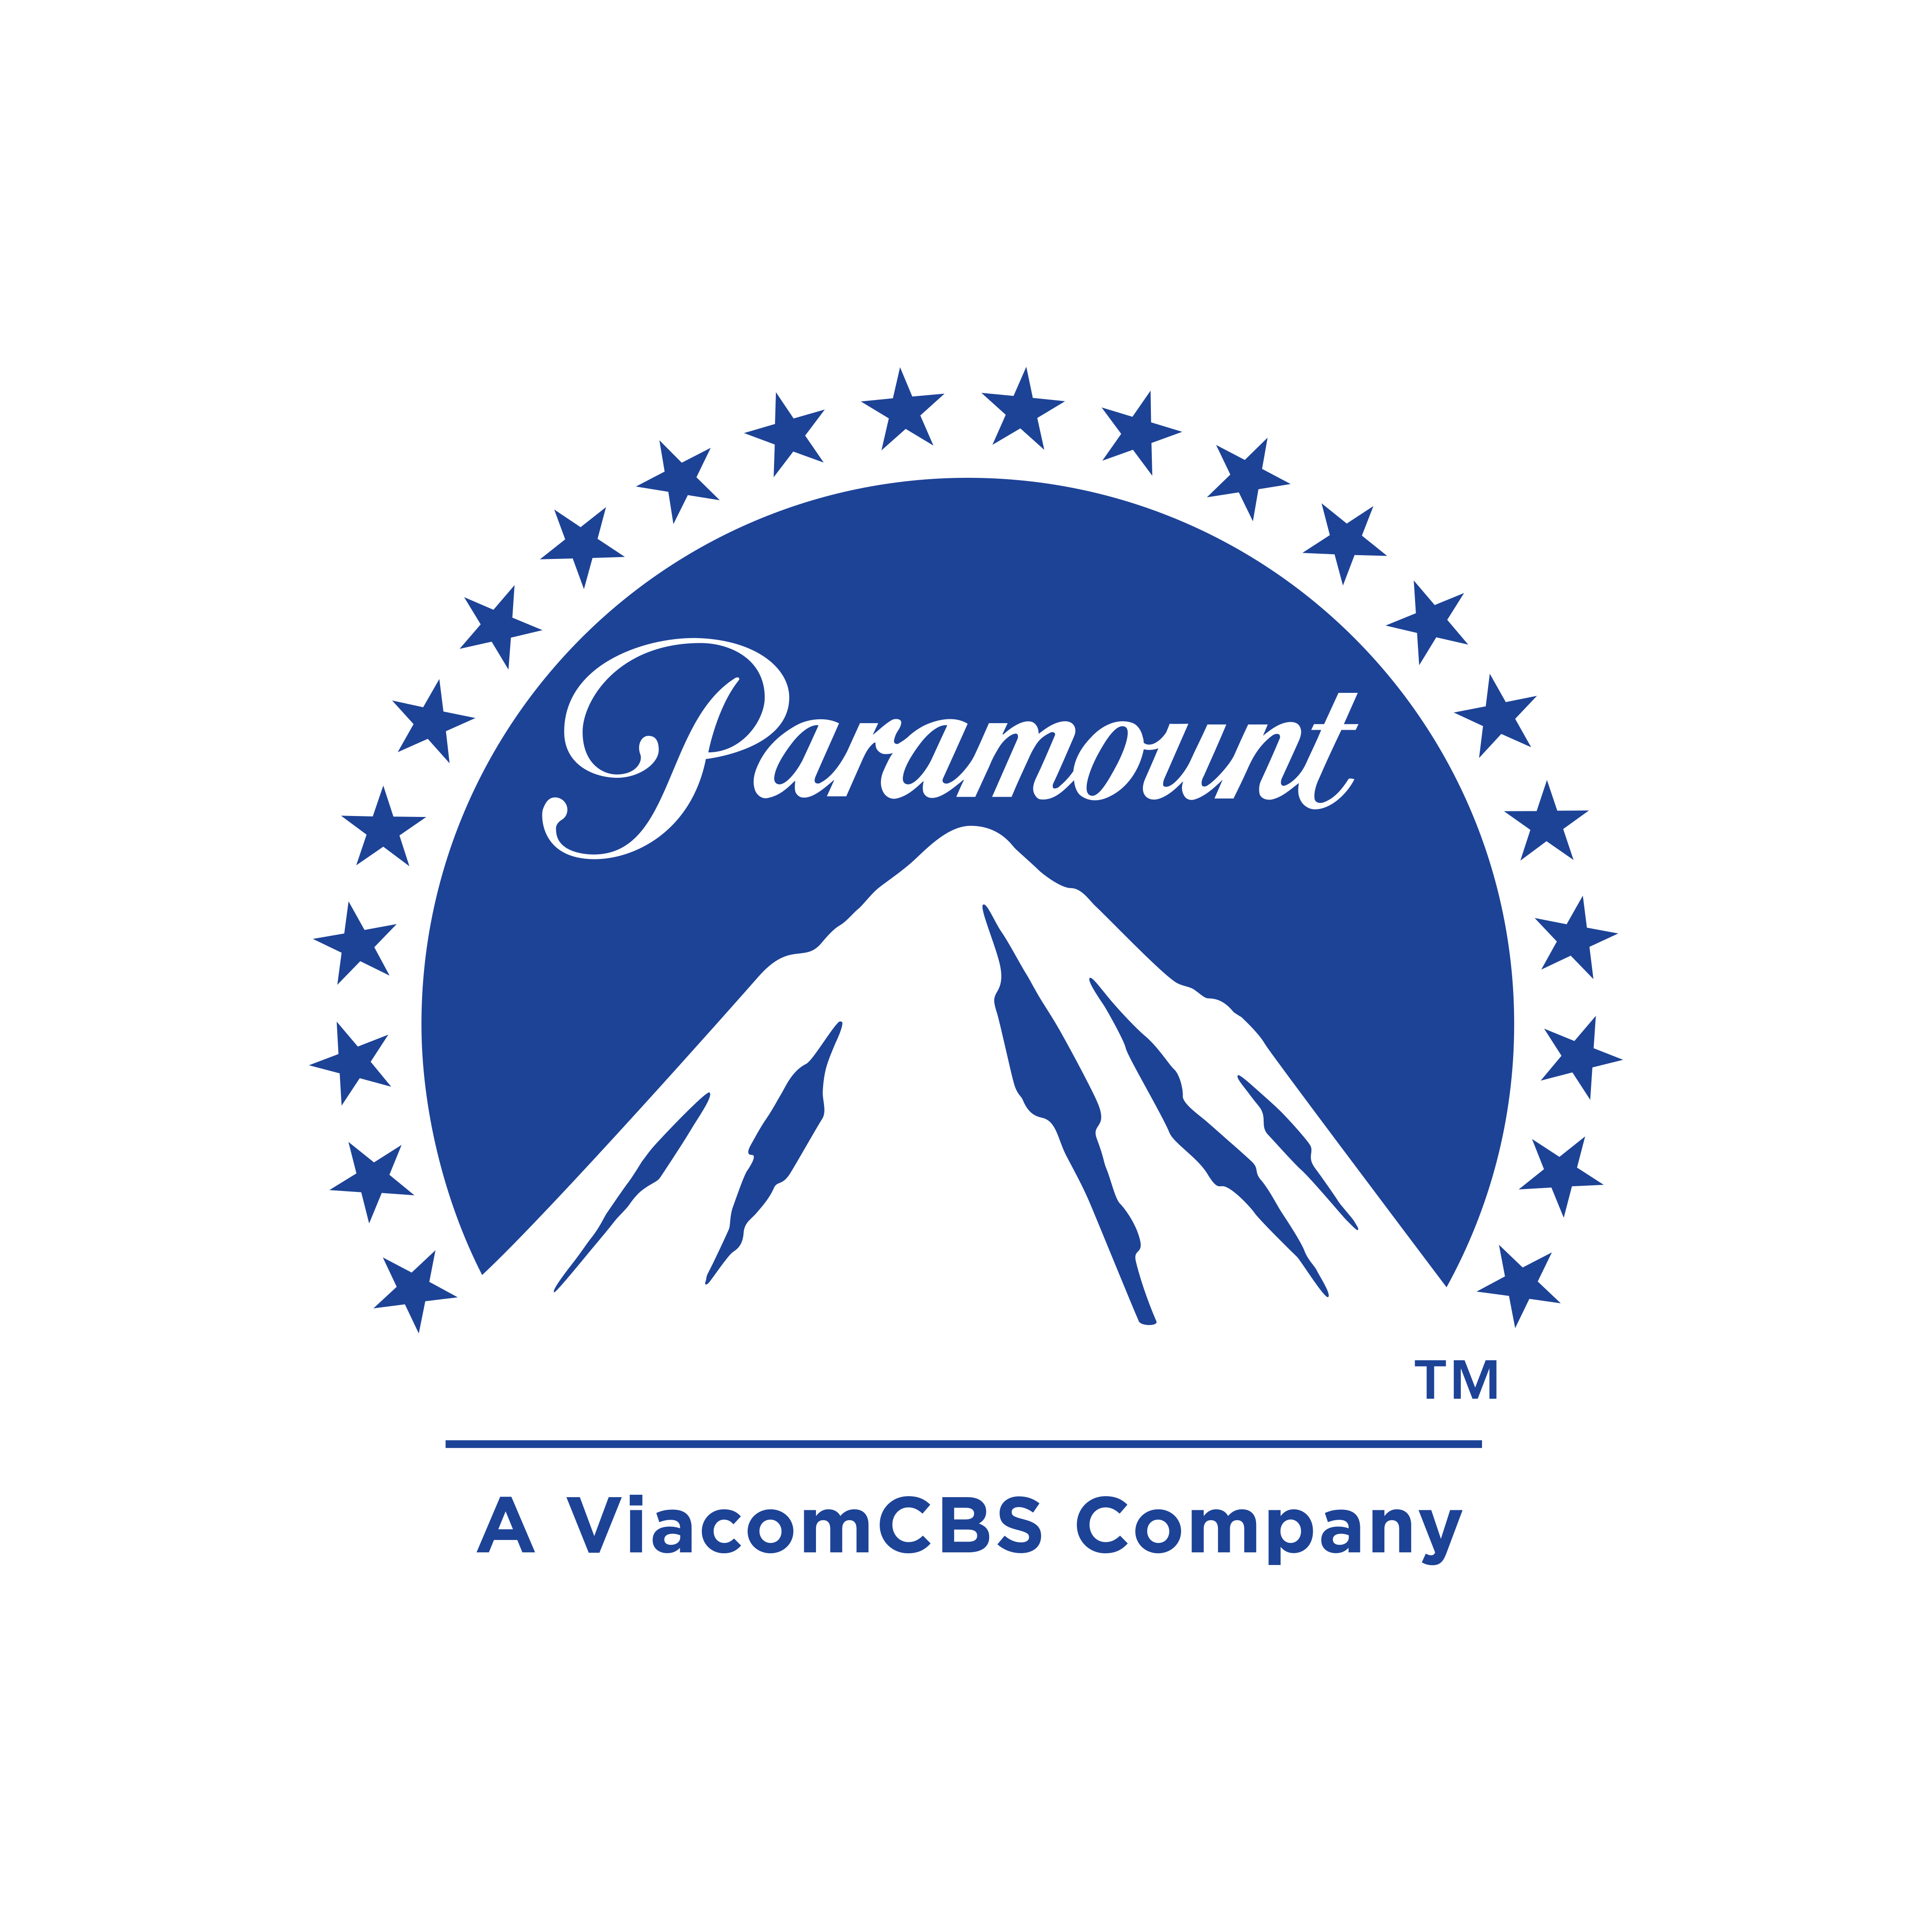 paramount logo 0 - Paramount Logo